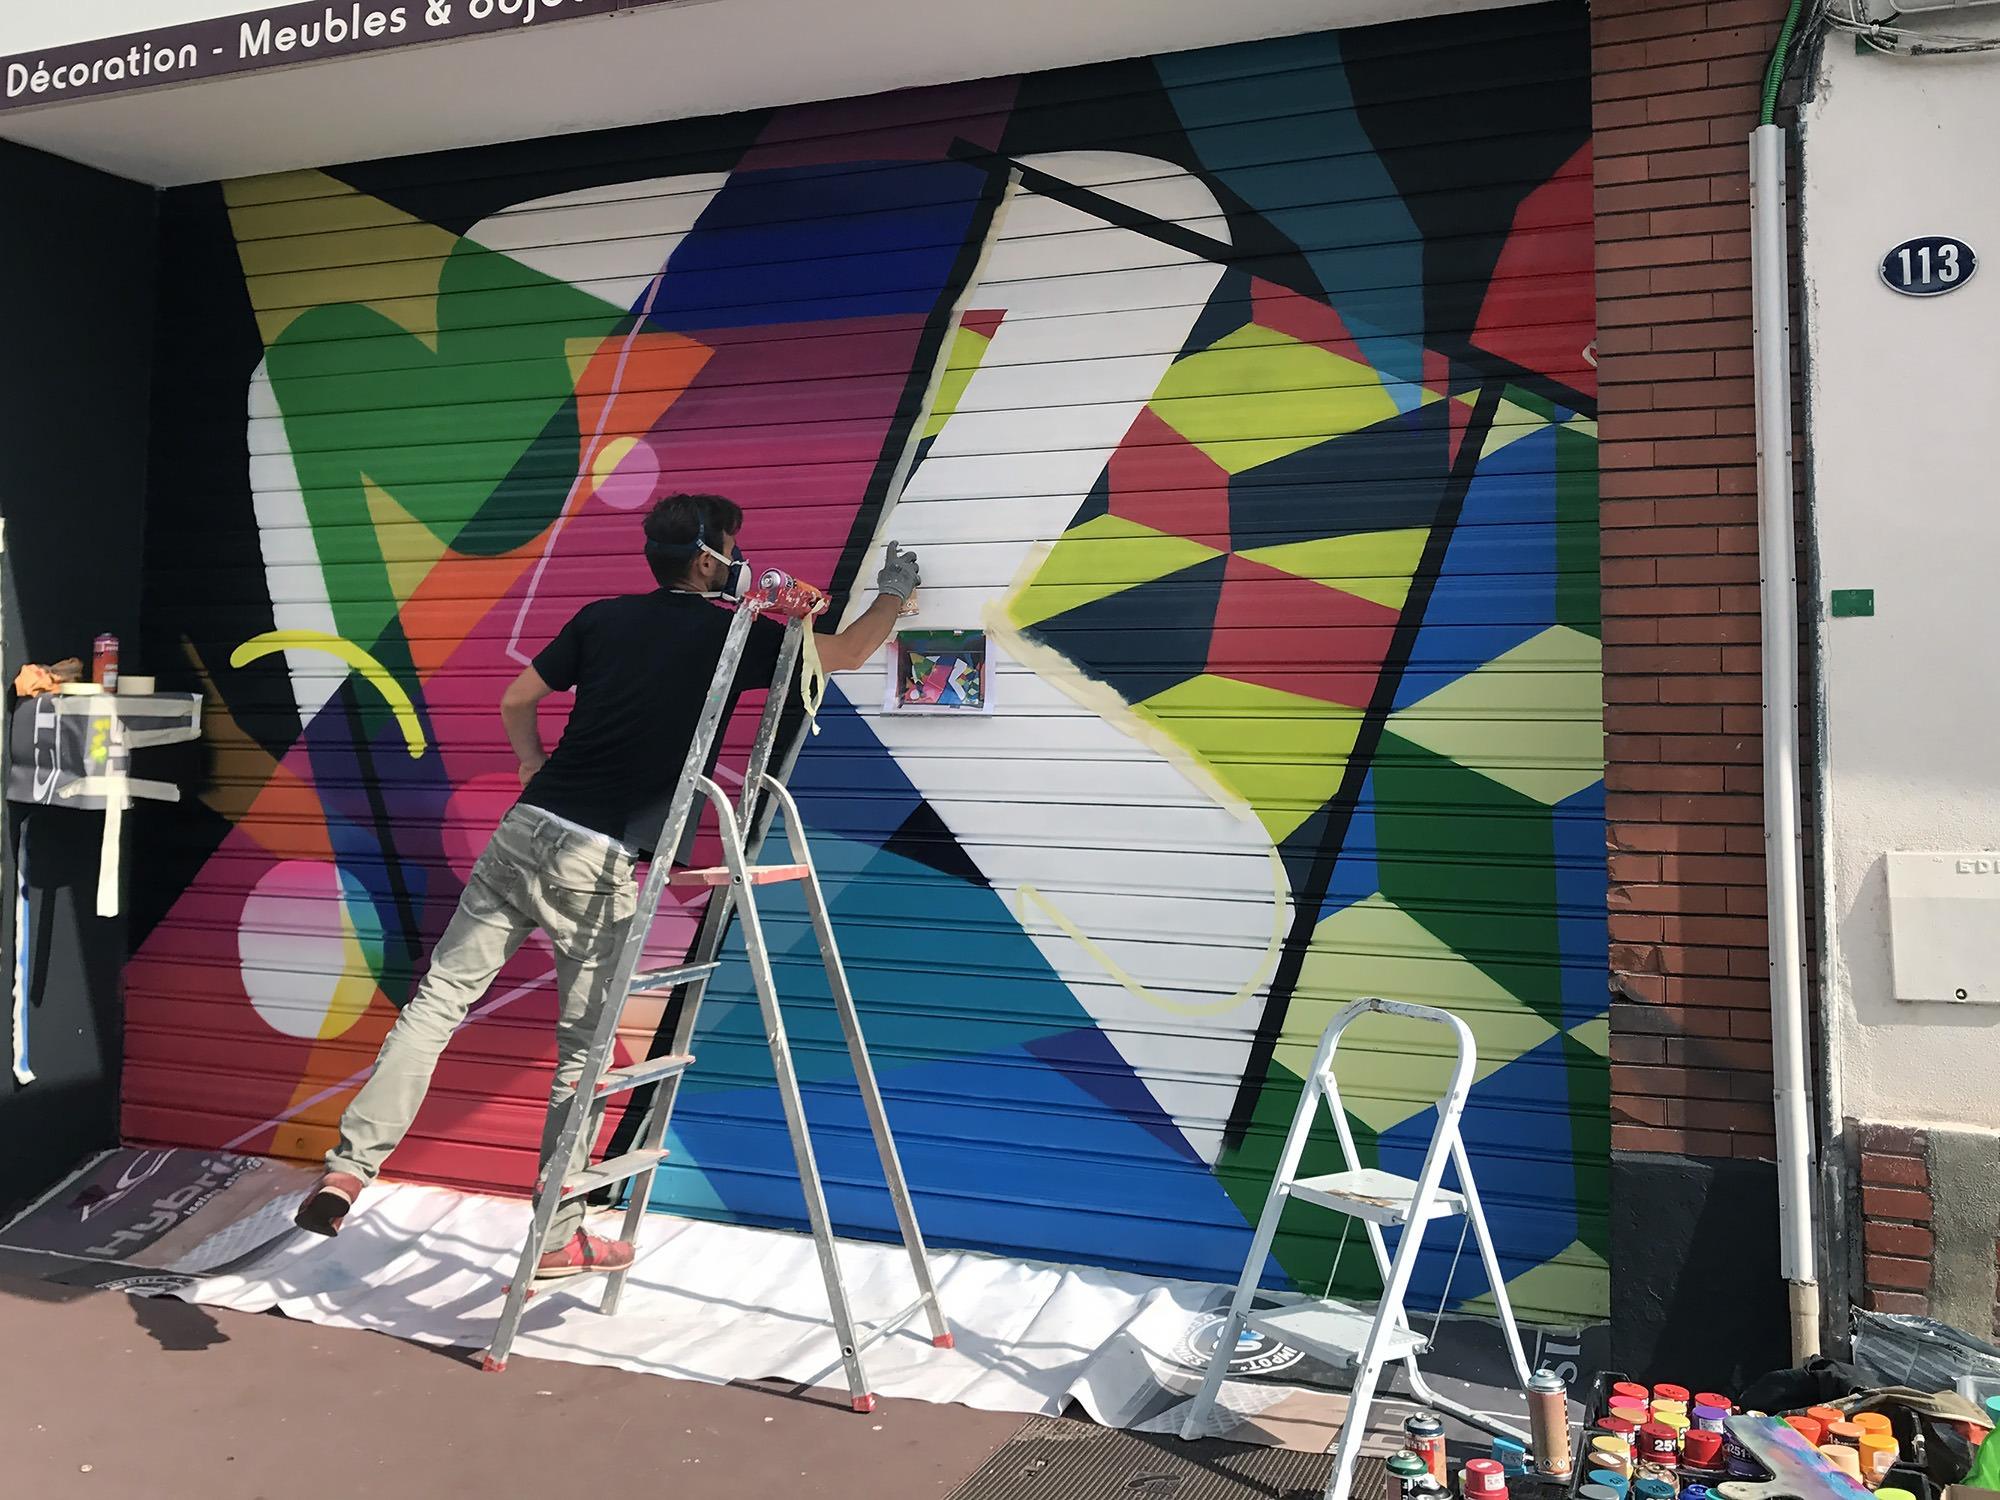 decoration rideau metallique devanture graffeur peintre